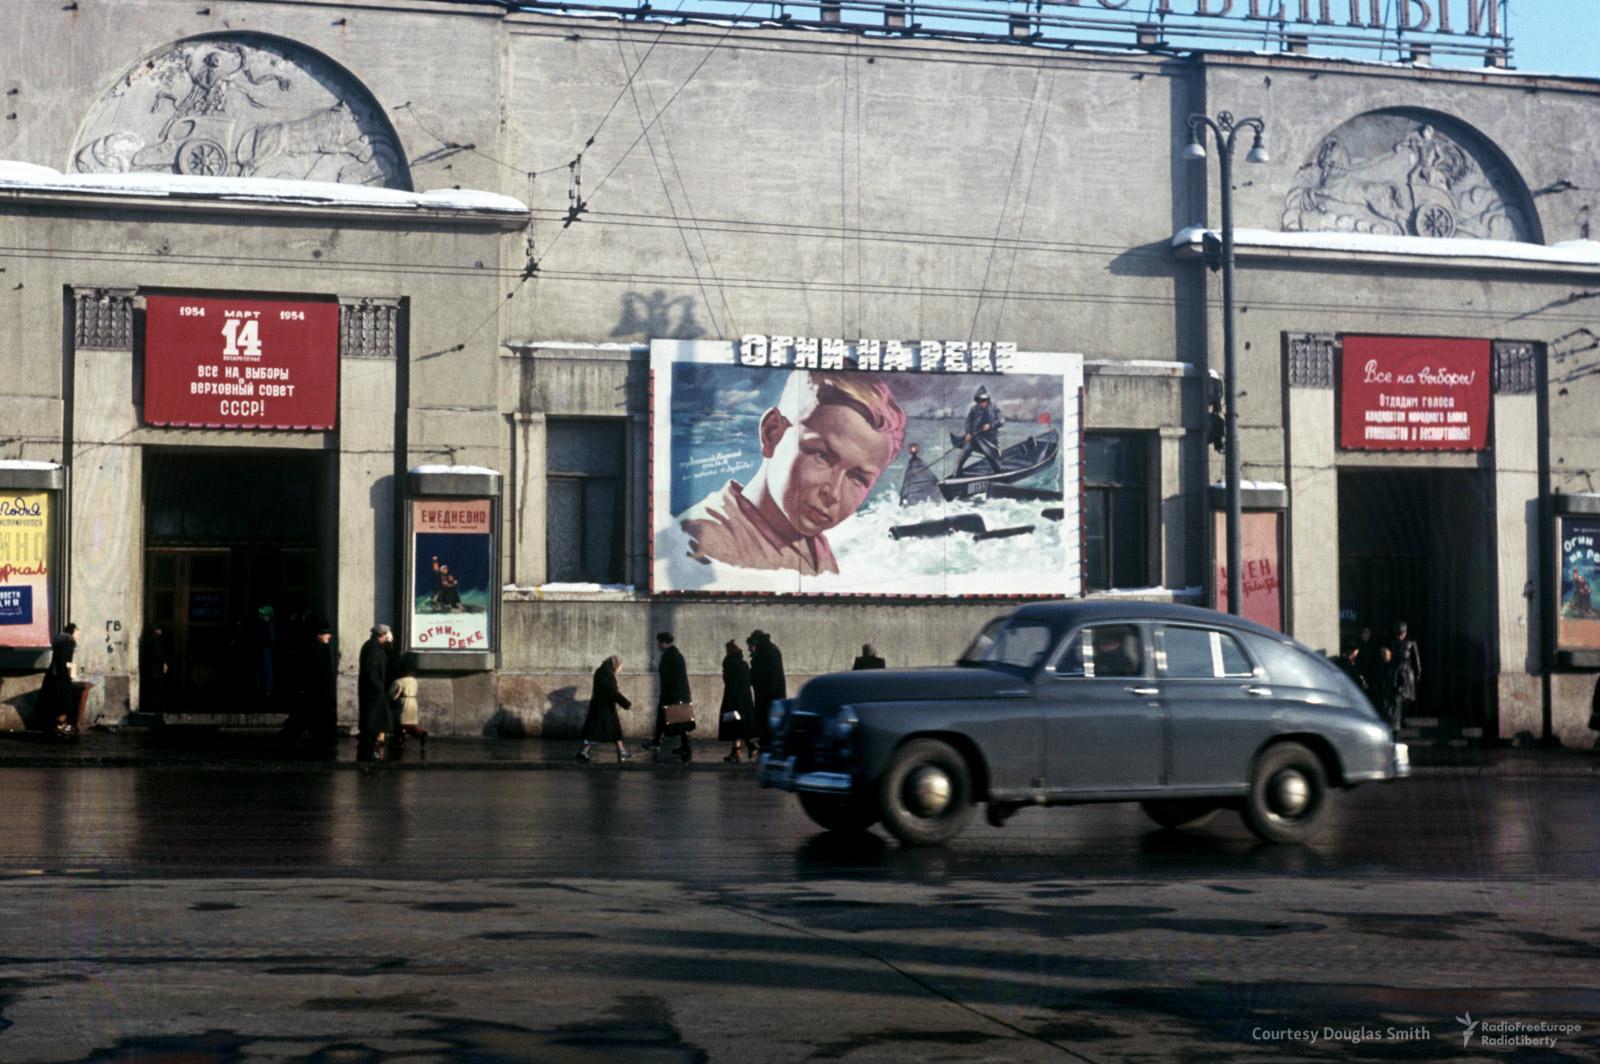 38. Кинотеатр на Арбатской площади в Москве. Афиша фильма 1953 года «Огни на реке»